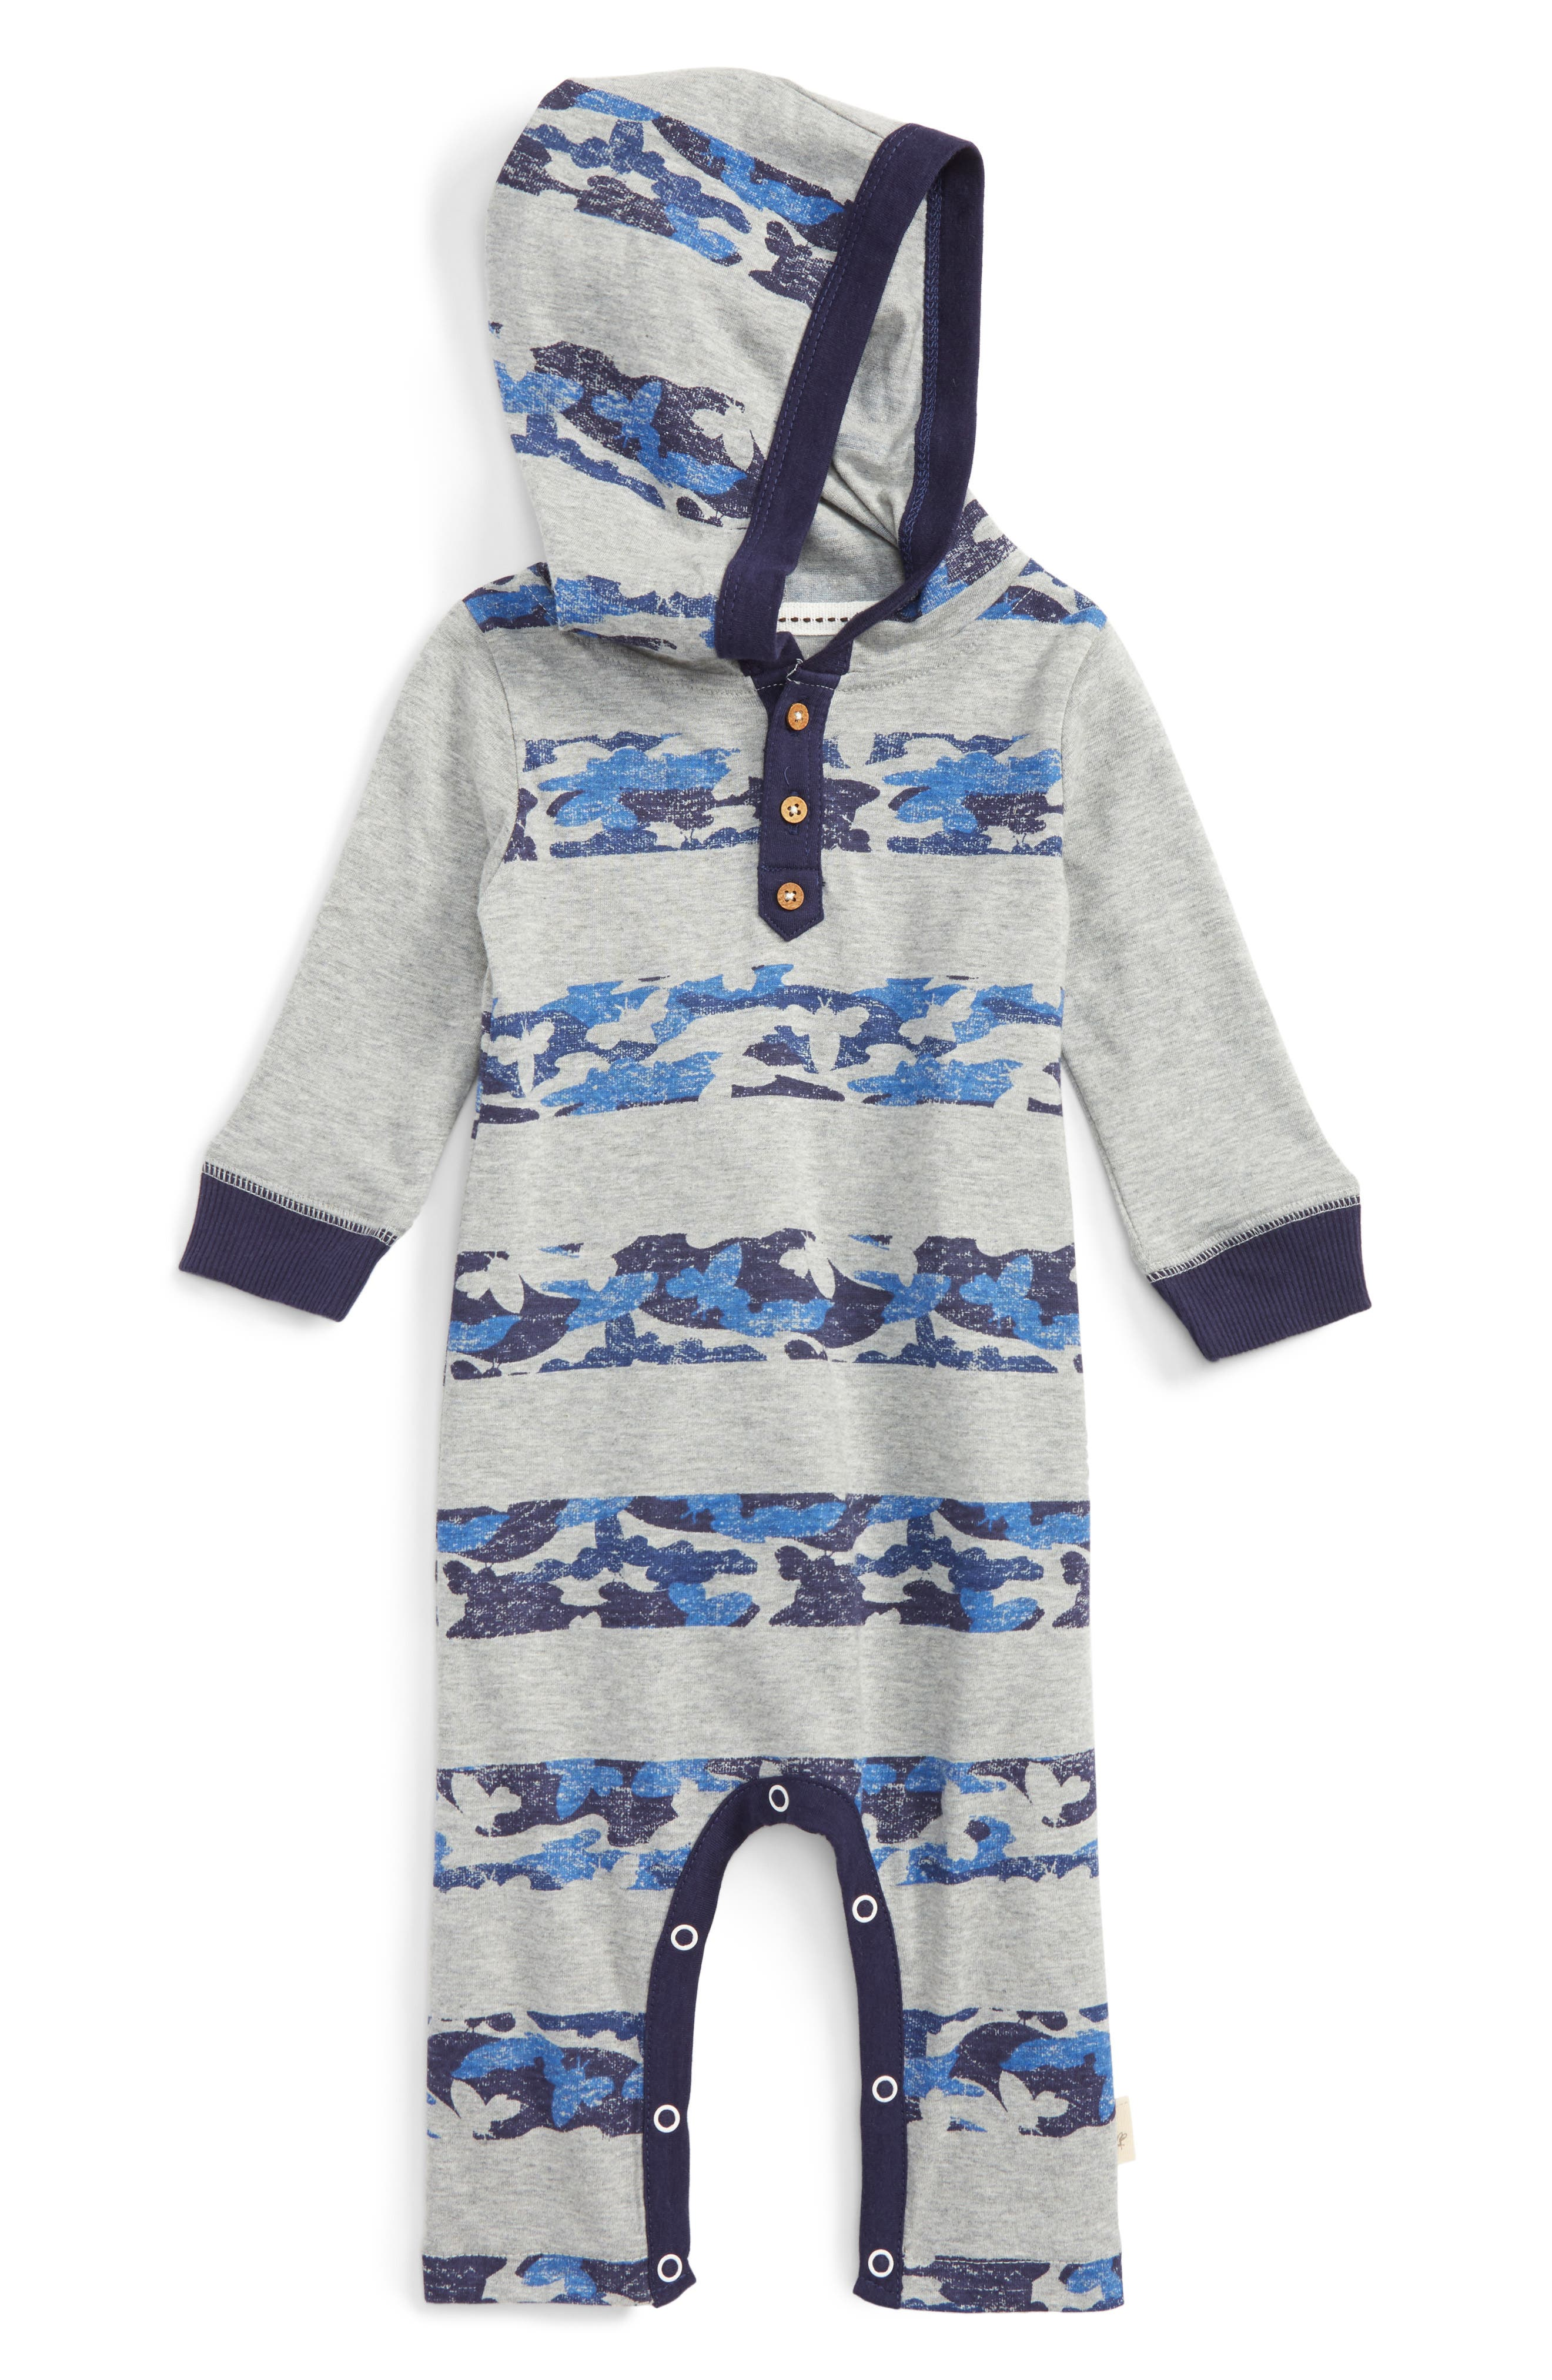 Alternate Image 1 Selected - Burt's Bees Baby Stripe Hooded Romper (Baby Boys)